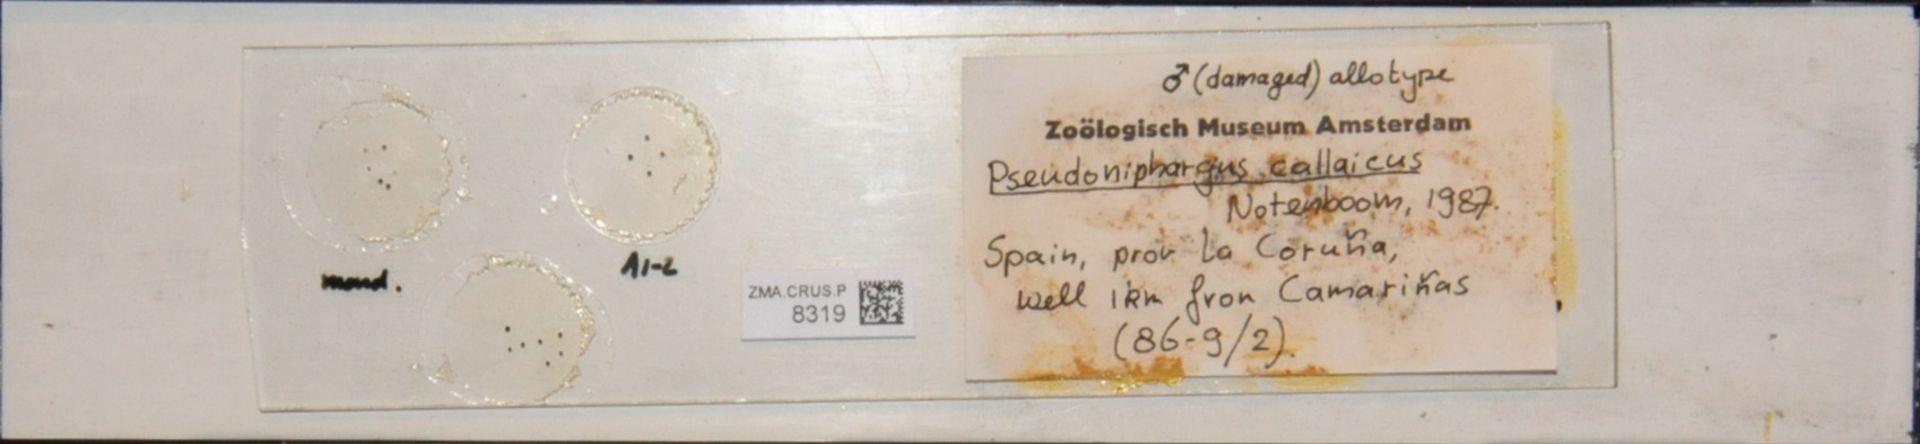 ZMA.CRUS.P.8319   Pseudoniphargus callaicus Notenboom, 1987